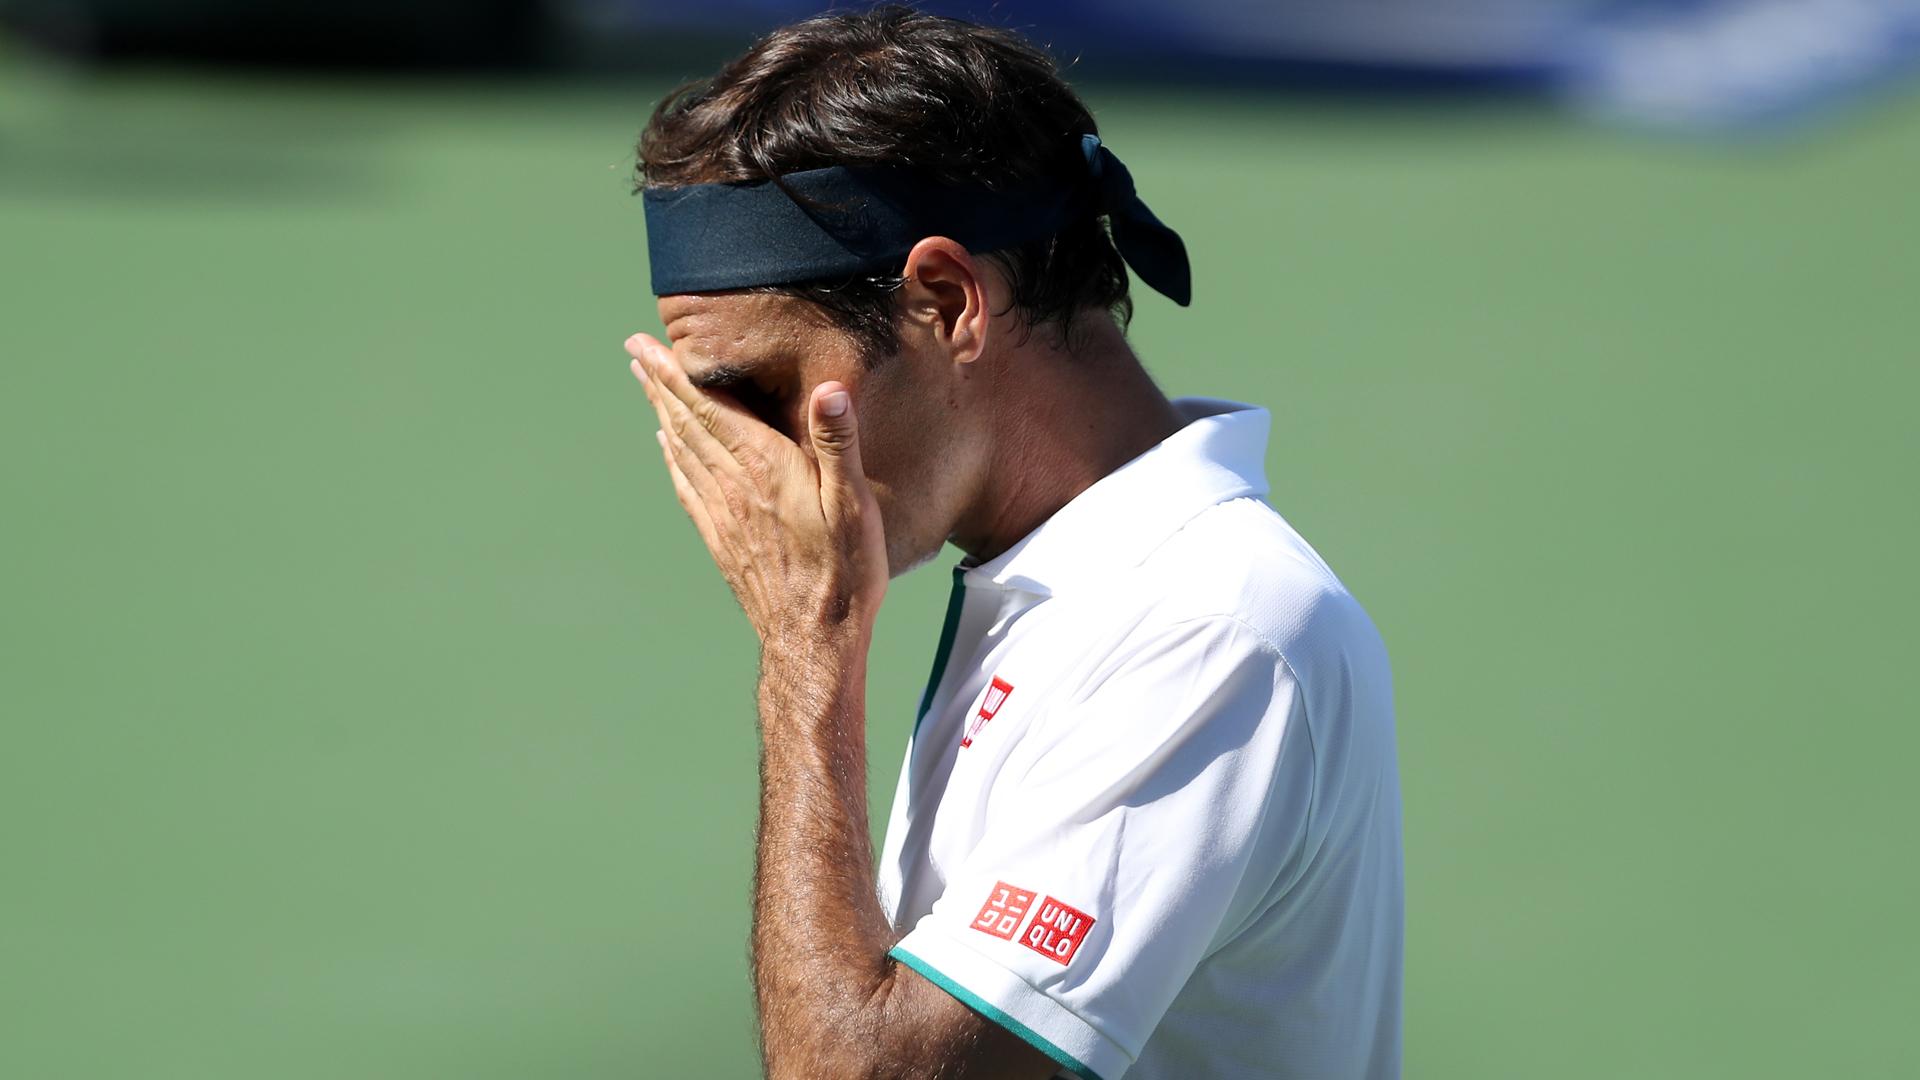 Federer falls to 'perfect' Rublev, Djokovic cruises in Cincinnati